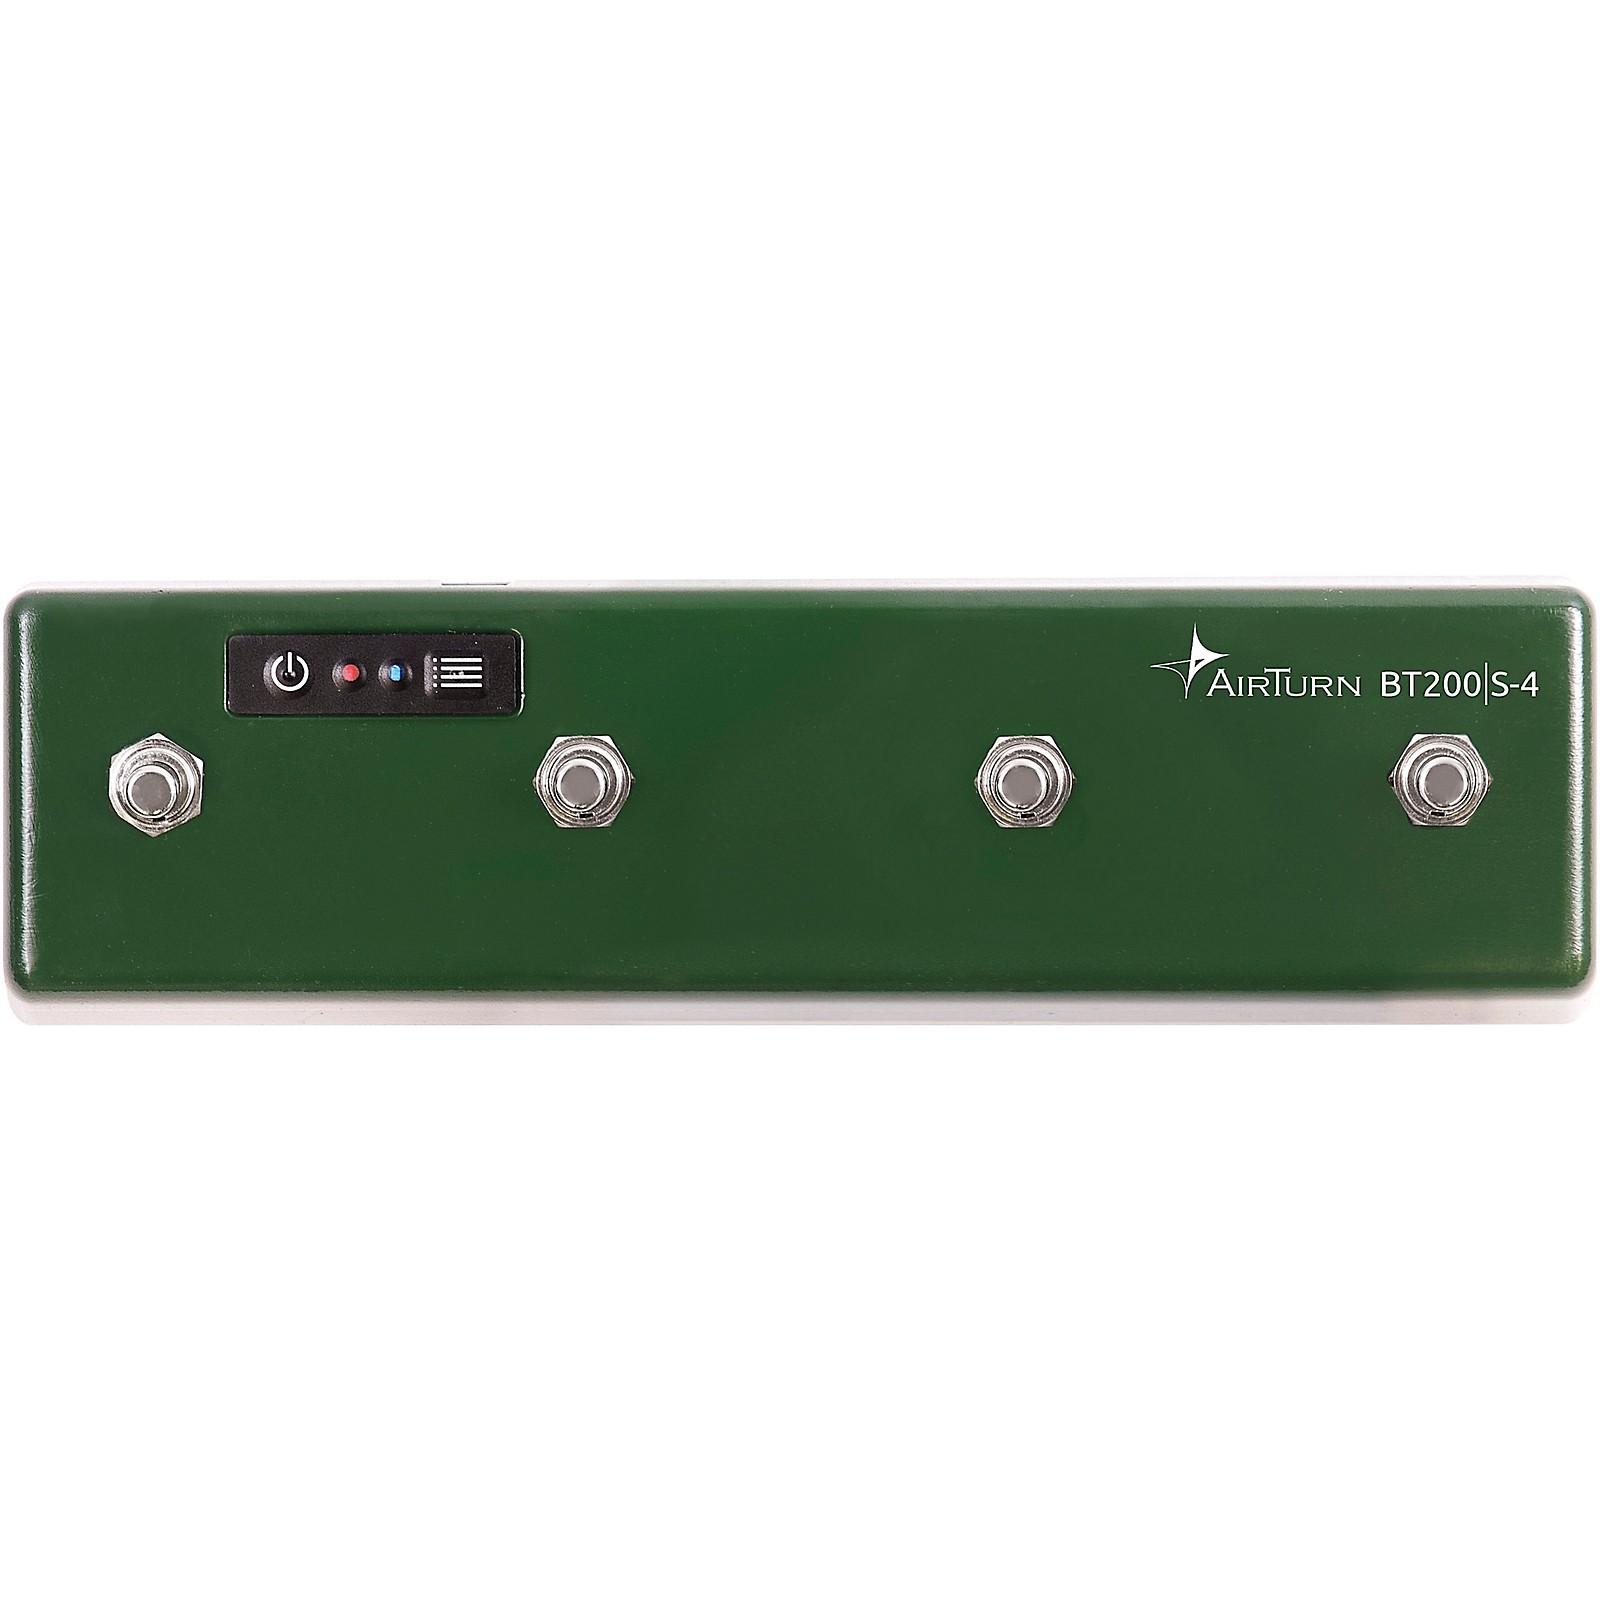 AirTurn BT200S-4 Bluetooth 4 Foot Switch Controller